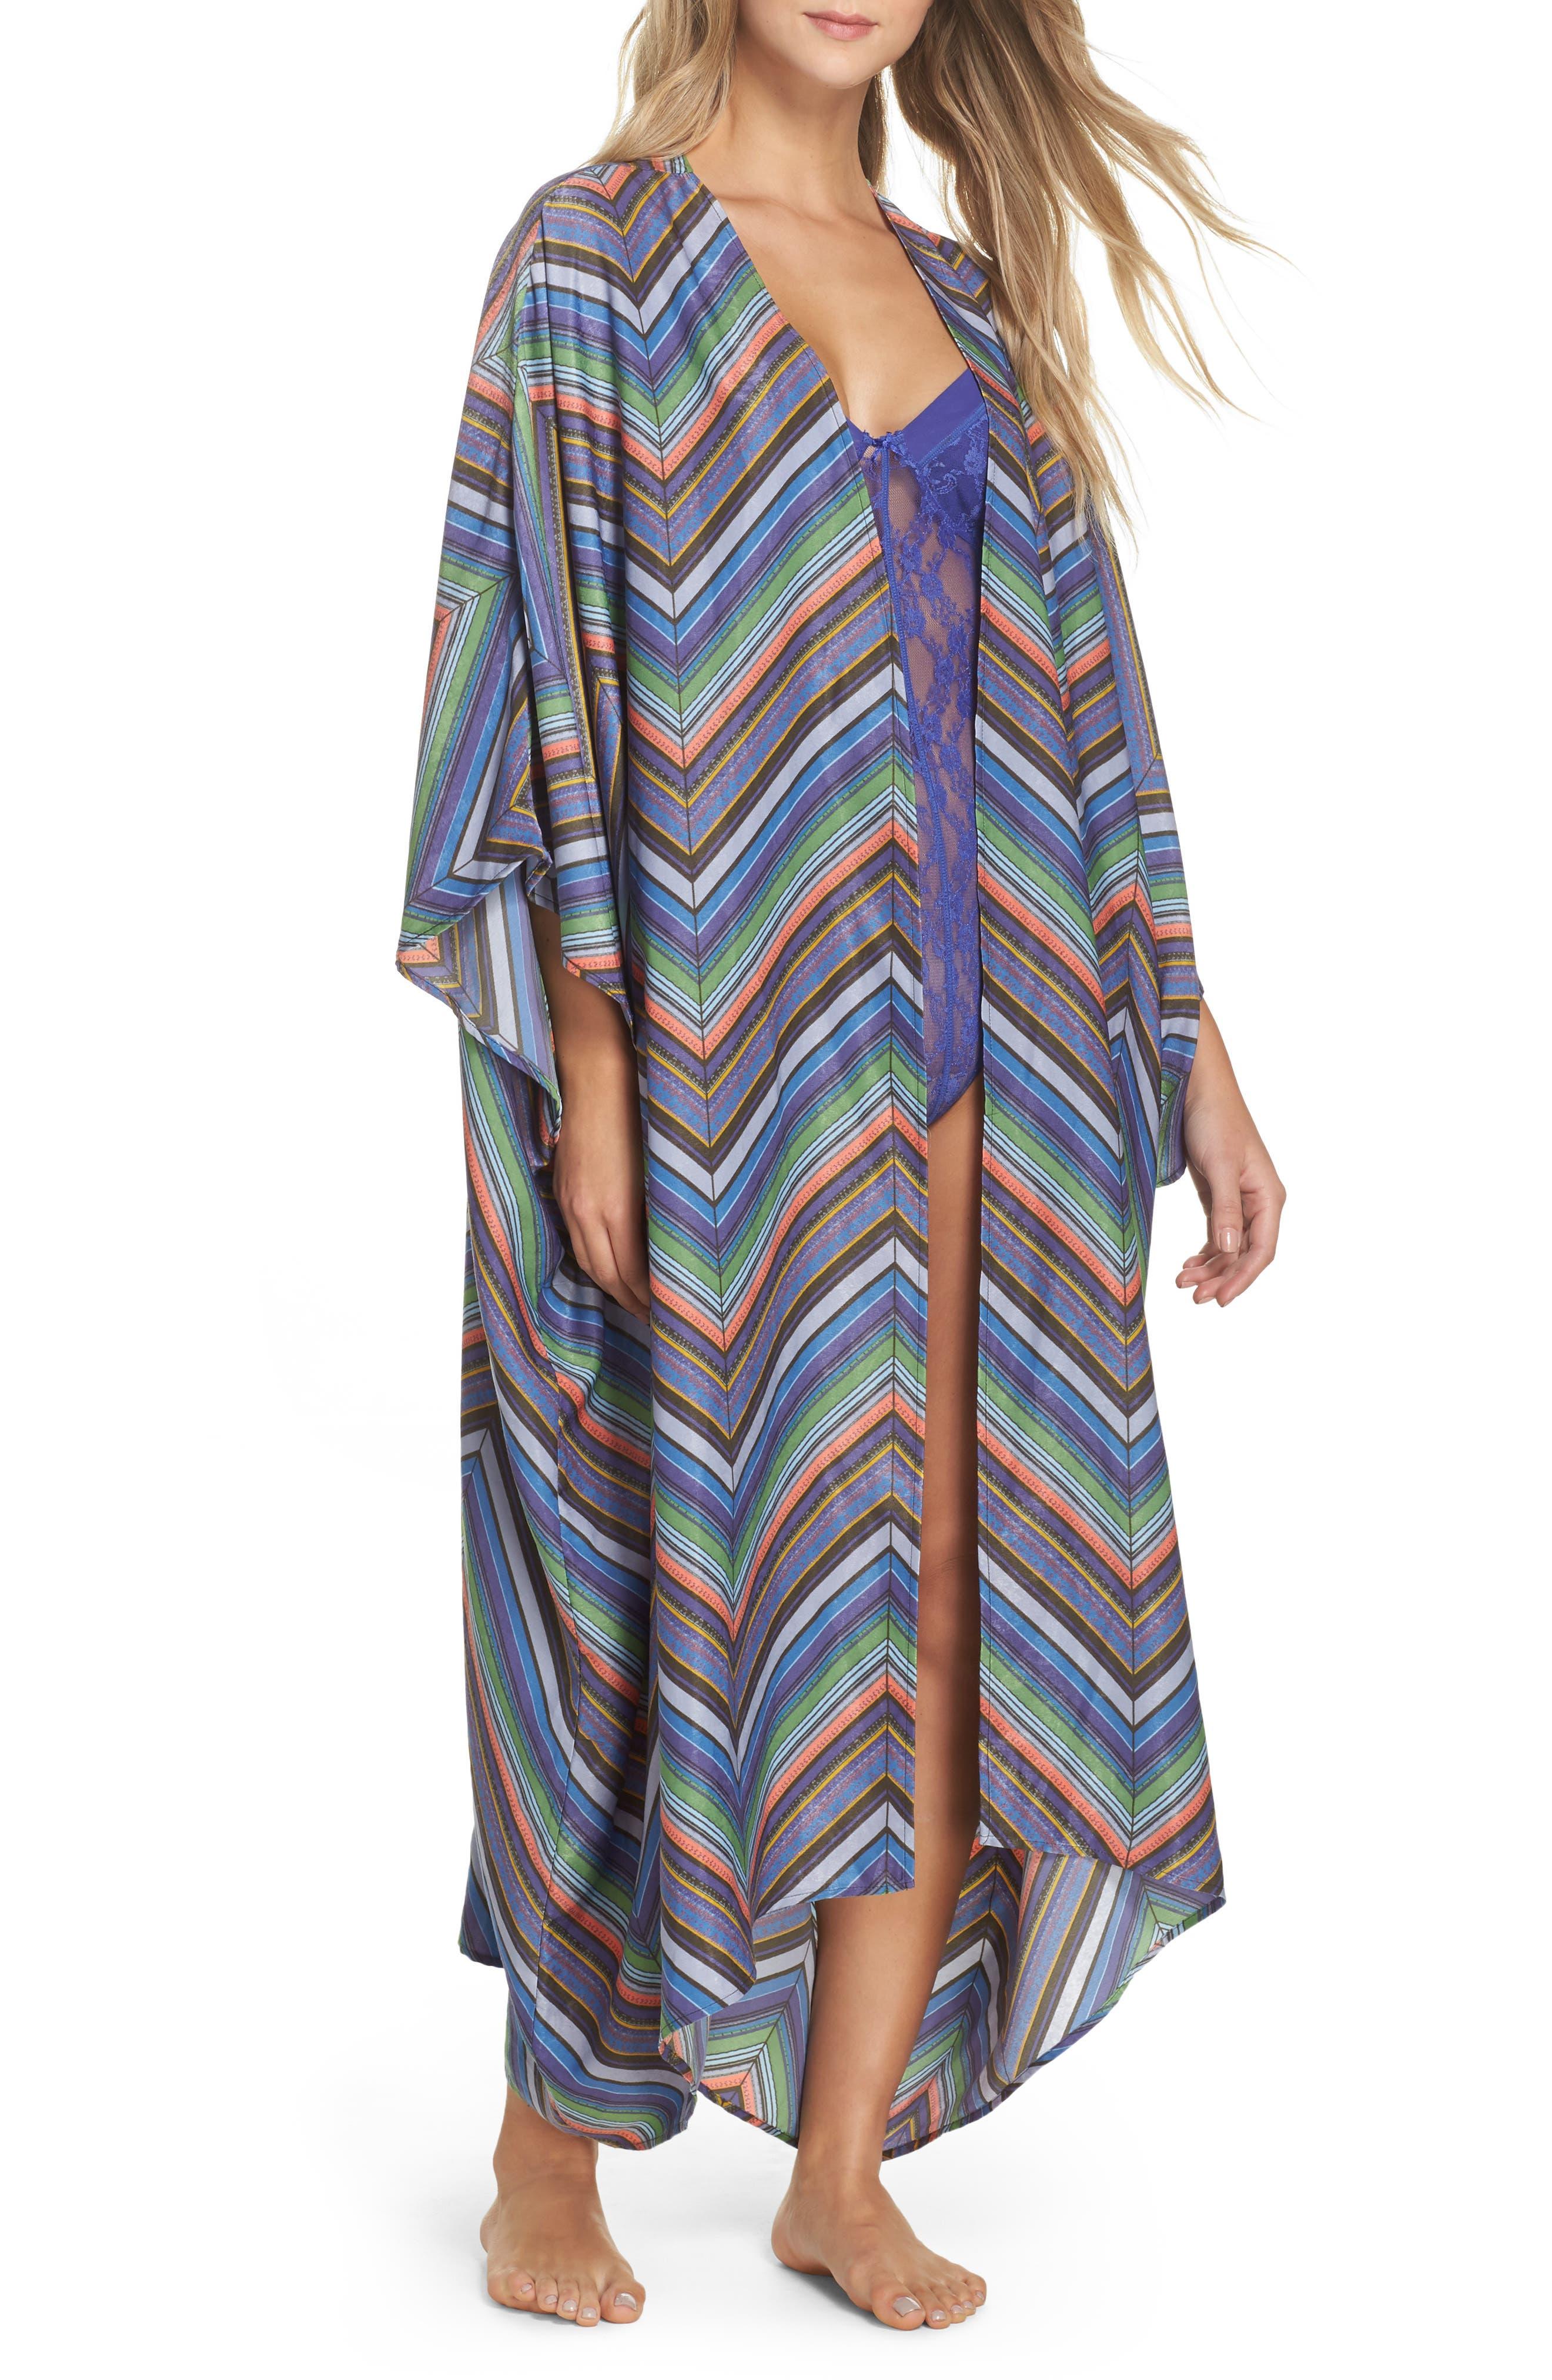 Mojave Limono Robe,                         Main,                         color, 410